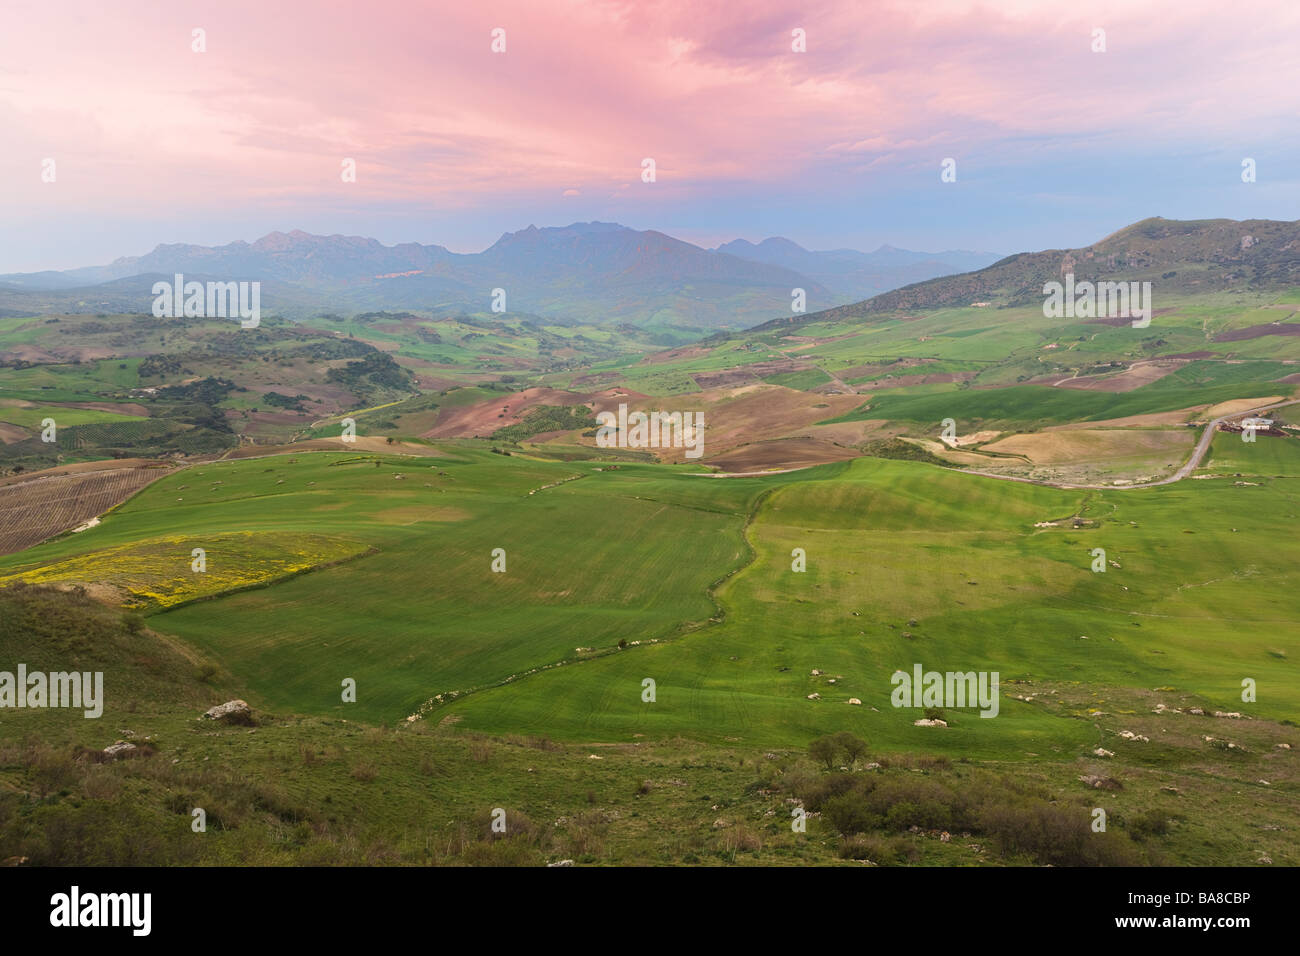 Countryside in the Serrania de Ronda in front of Roman ruins of Acinipo, Malaga Province, Spain. - Stock Image